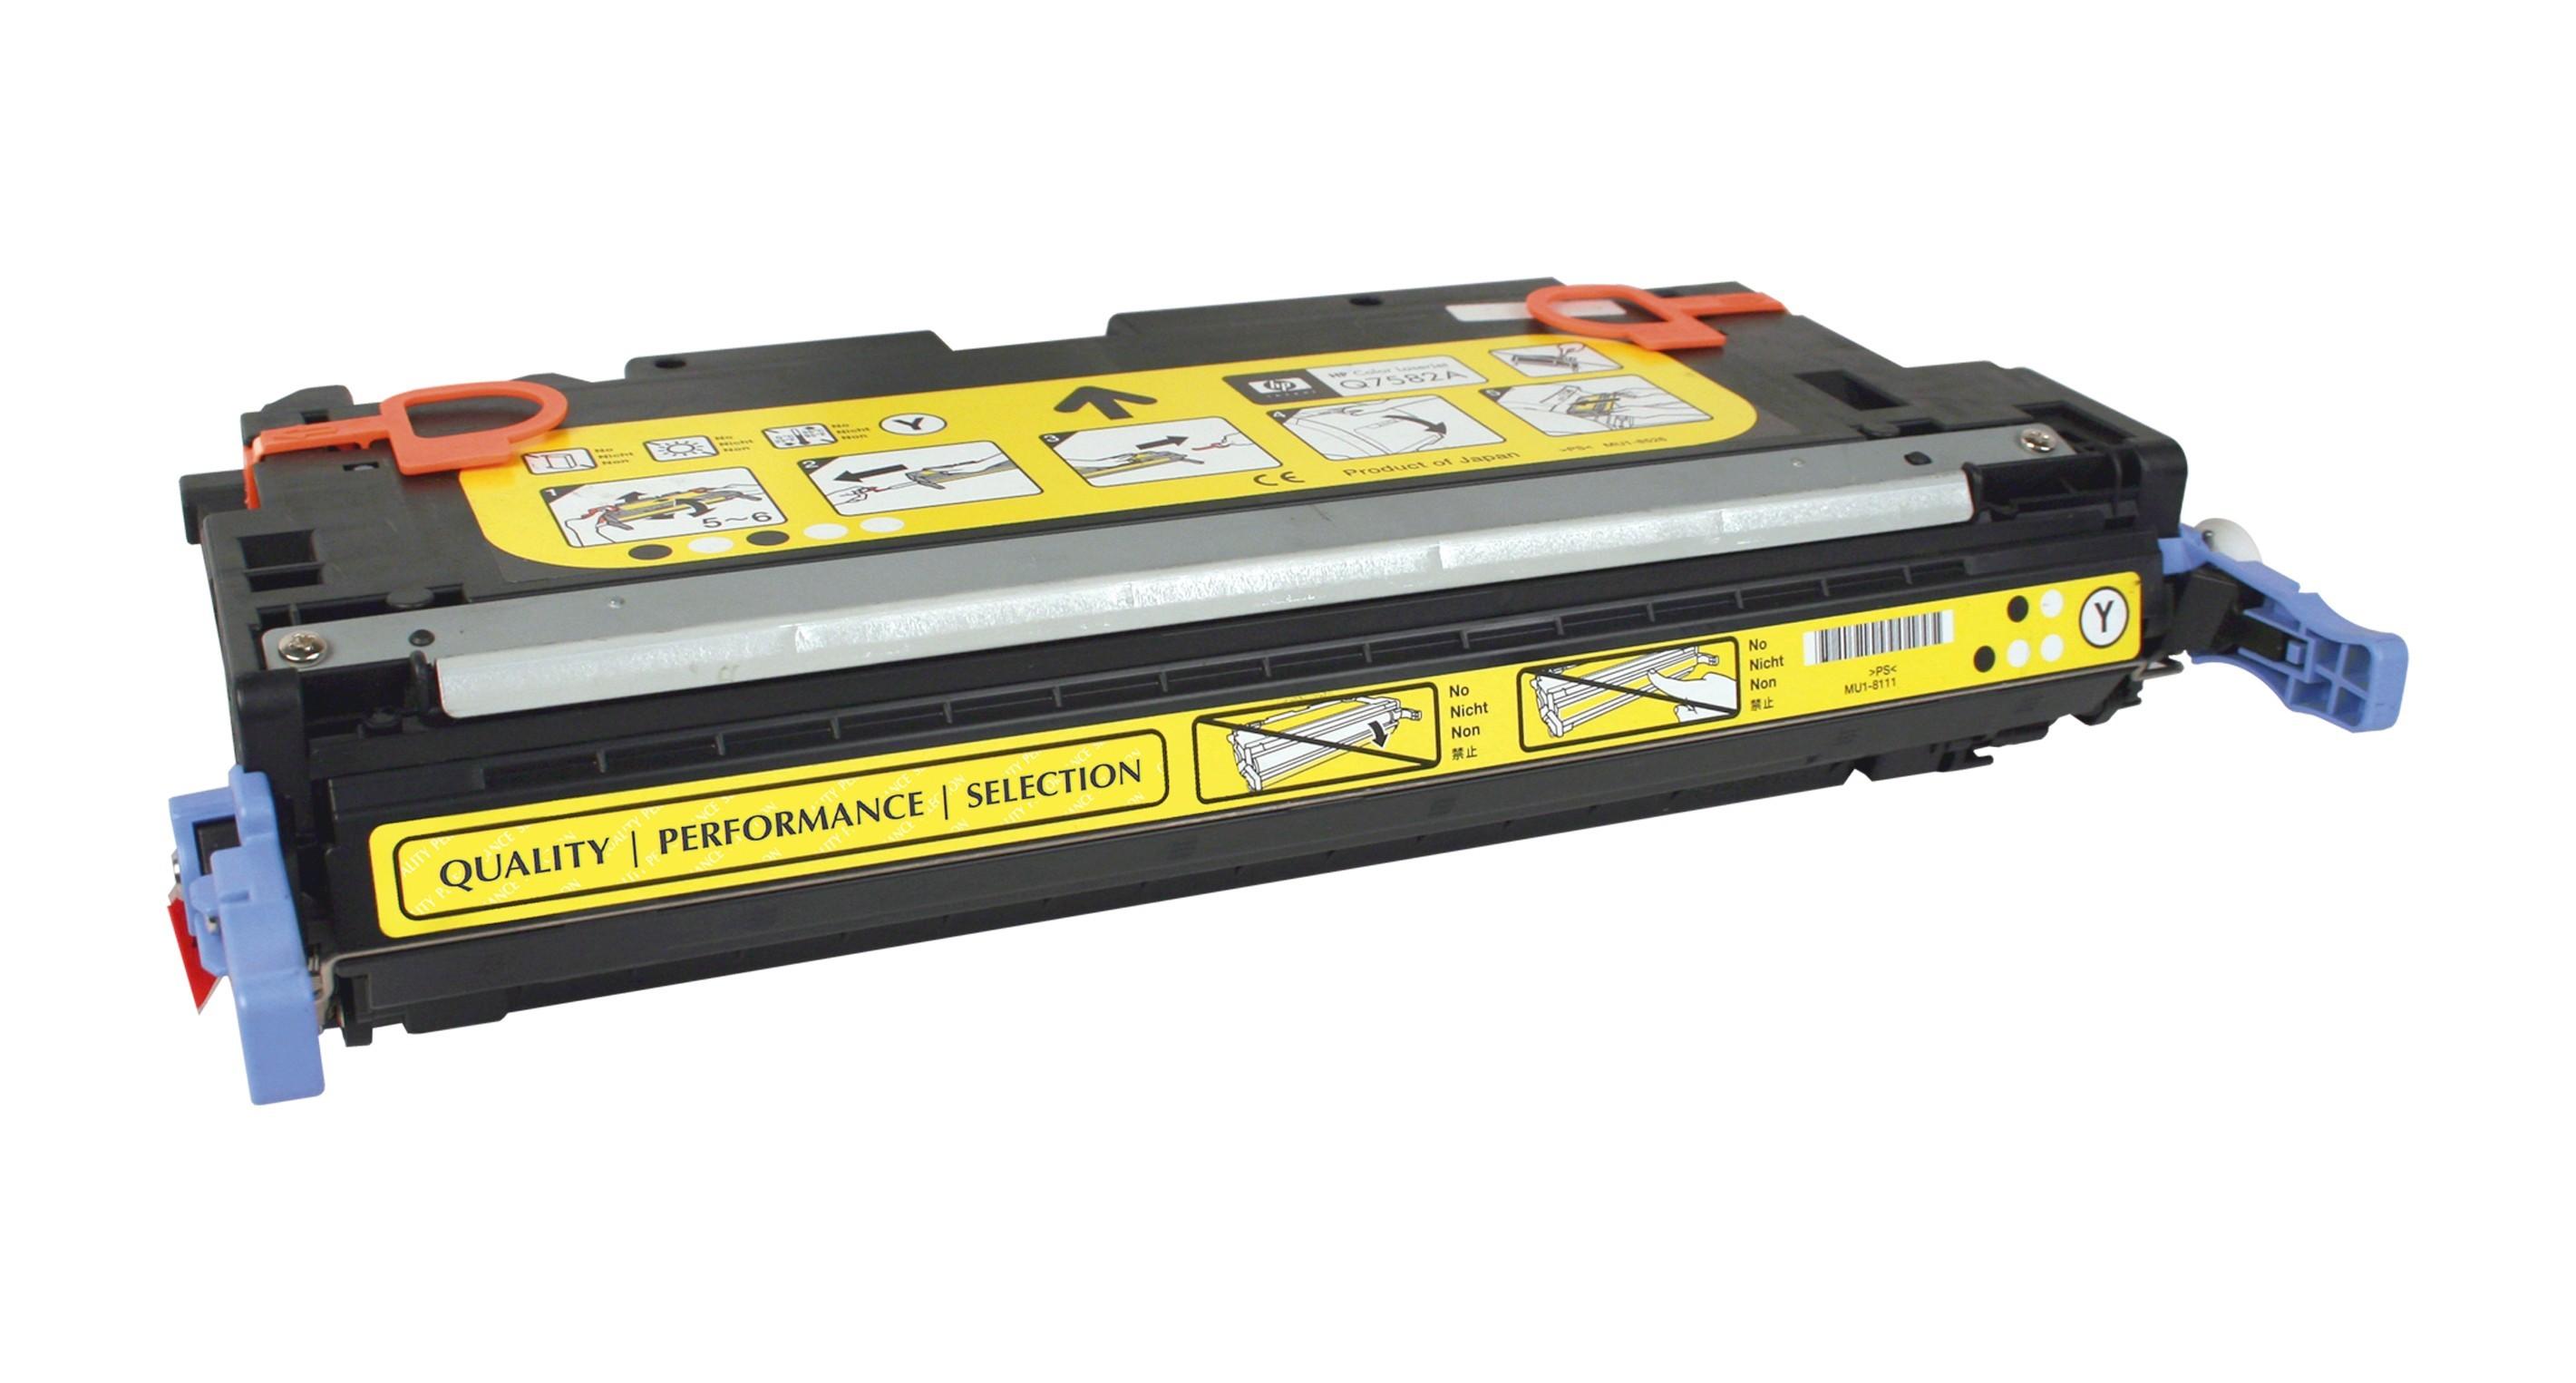 Cartus 314a C/y/m Compatibil Hp Remanufacturat Culoare: Yellow